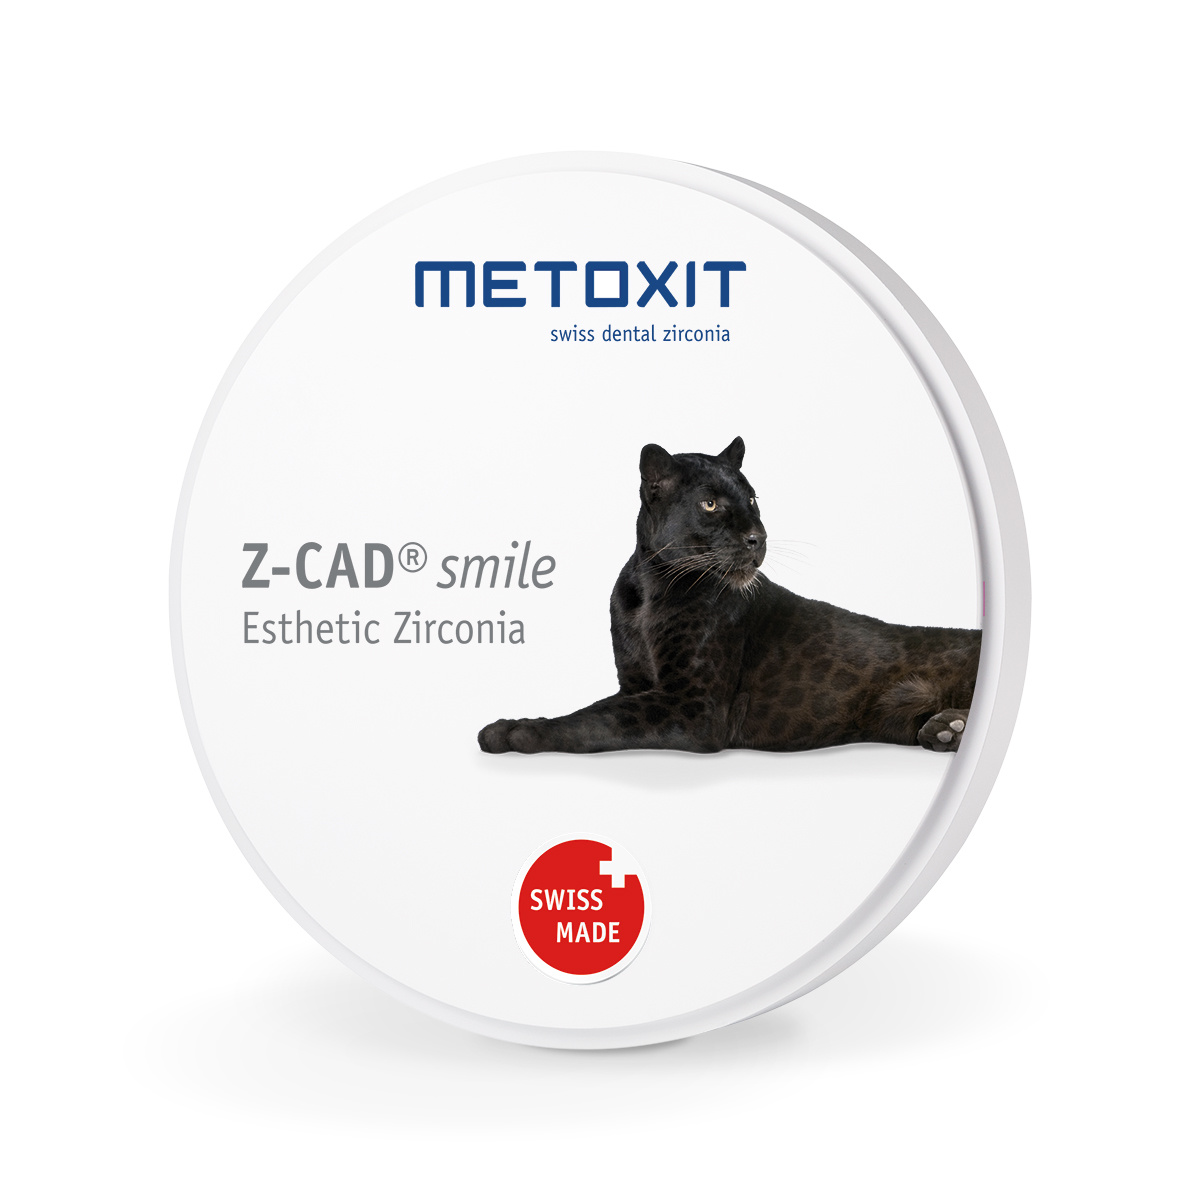 METOXIT Z-CAD® smile - 98.5x16mm